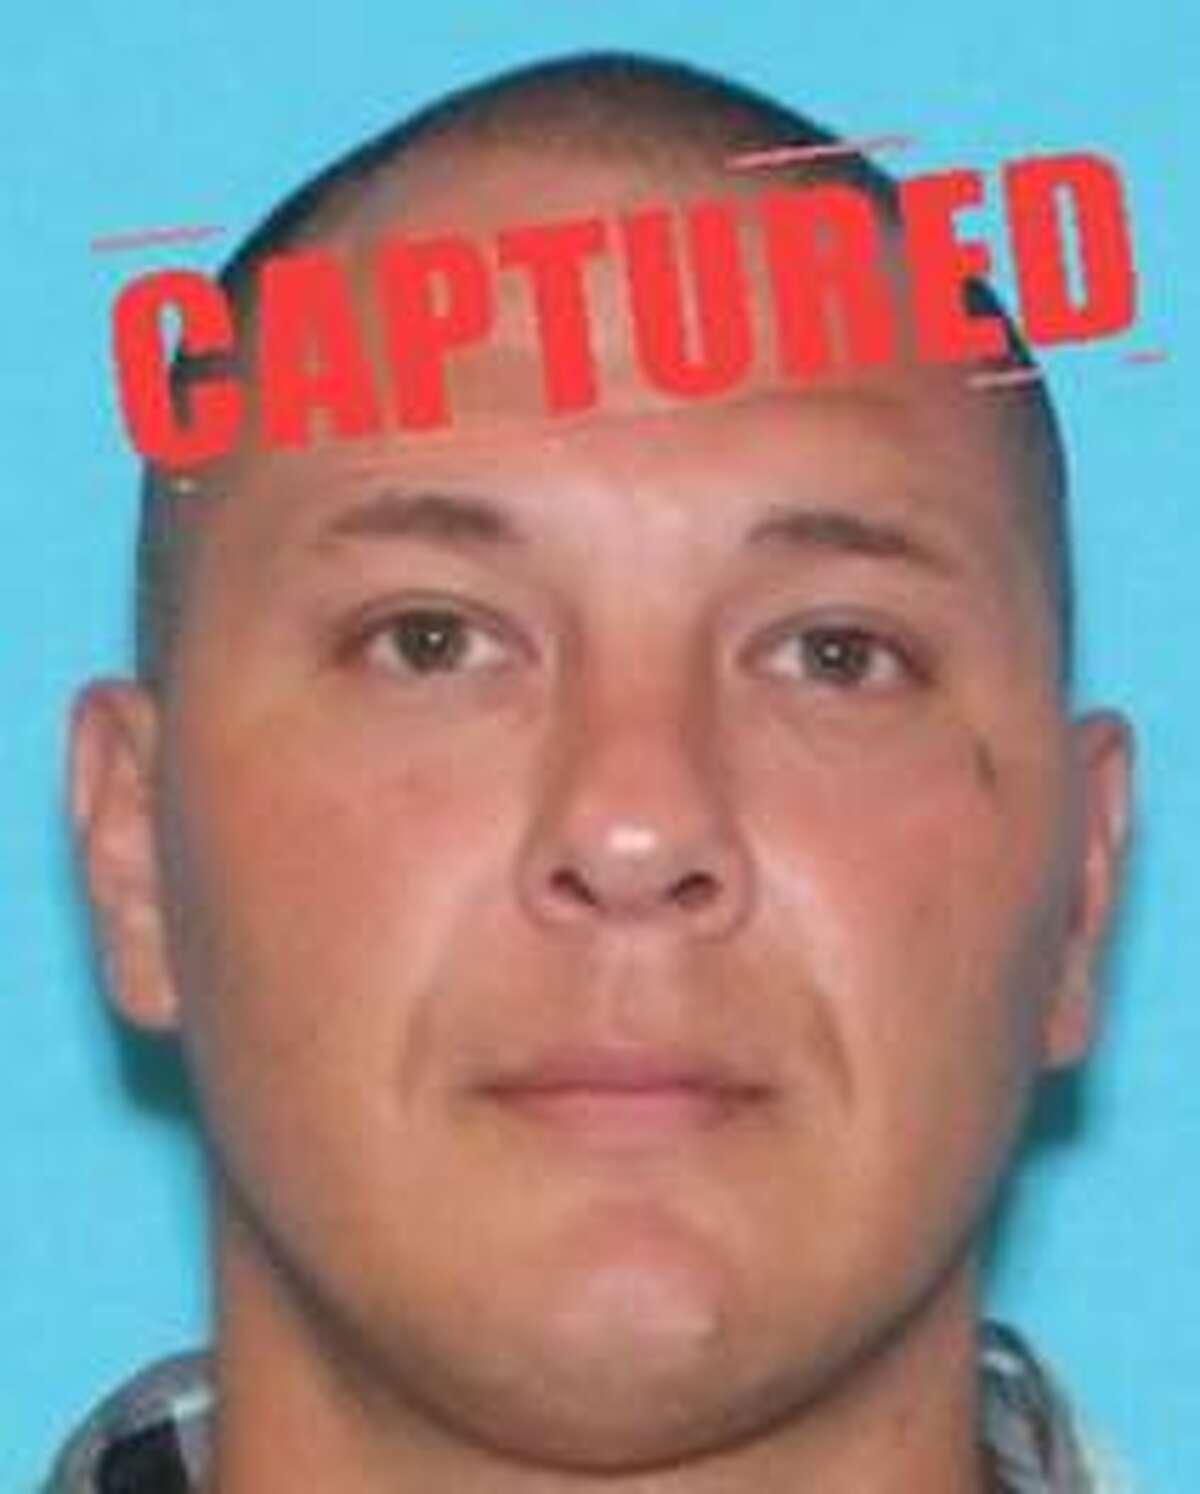 David Lee Gonzales was taken into custody Tuesday for a parole violation.